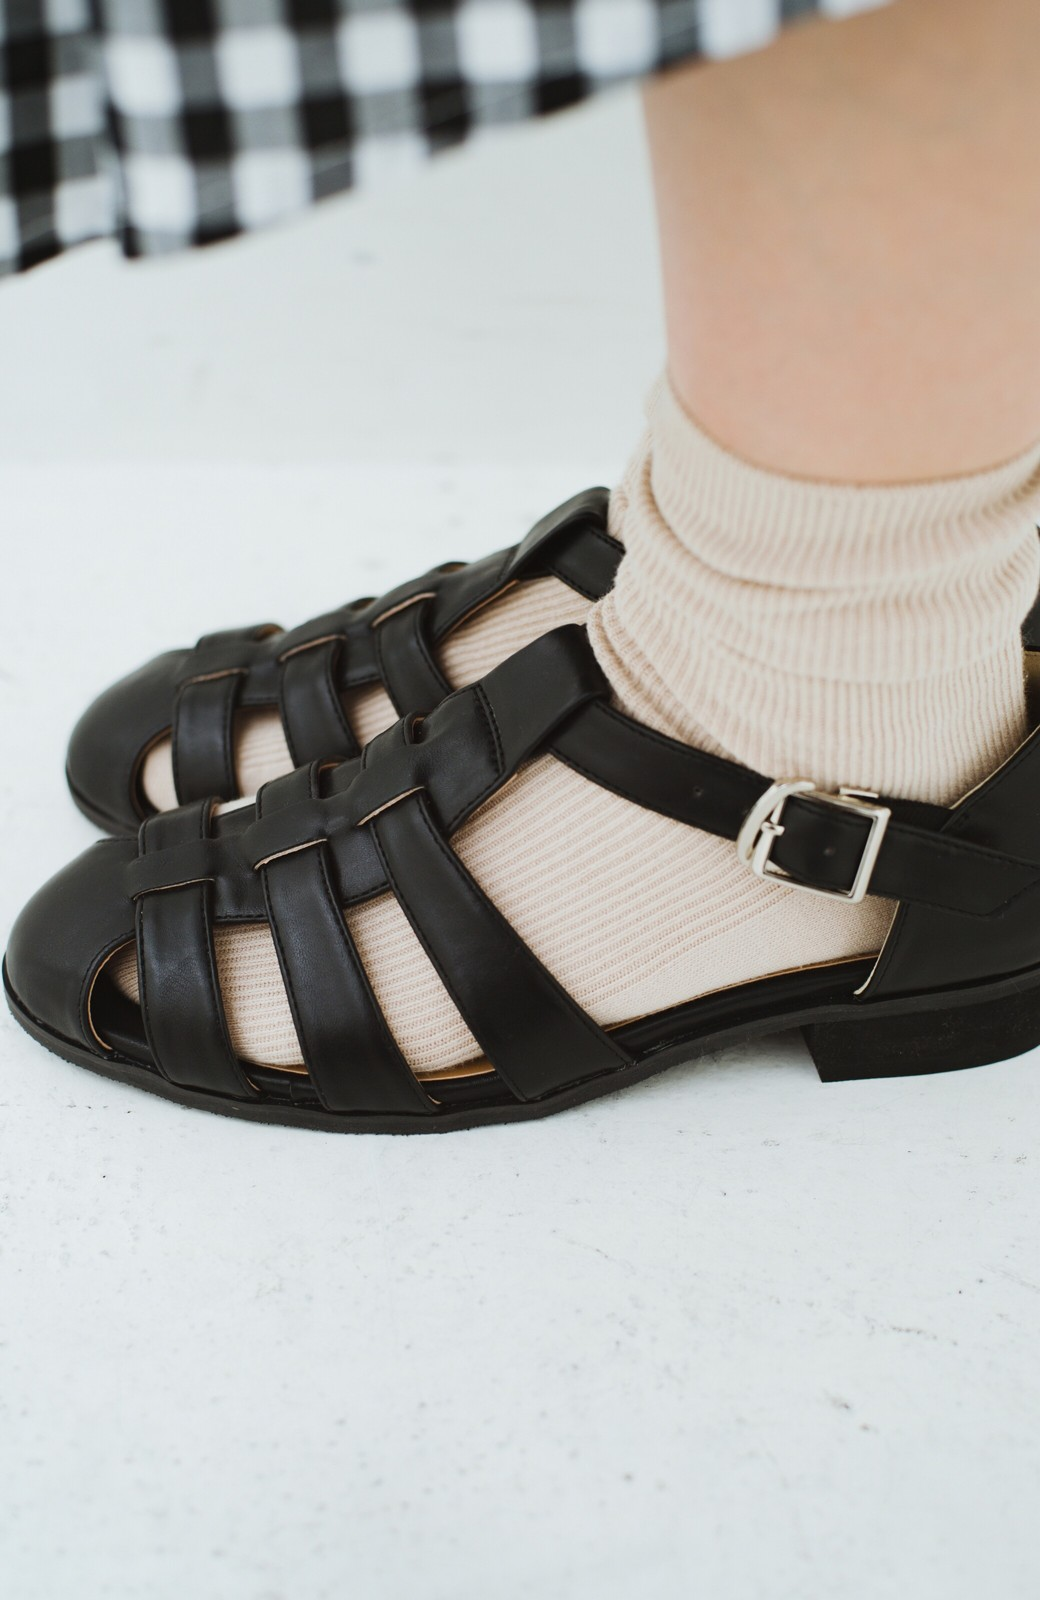 haco! 靴下でも素足でも合う 本革風編み込みサンダル <ブラック>の商品写真12